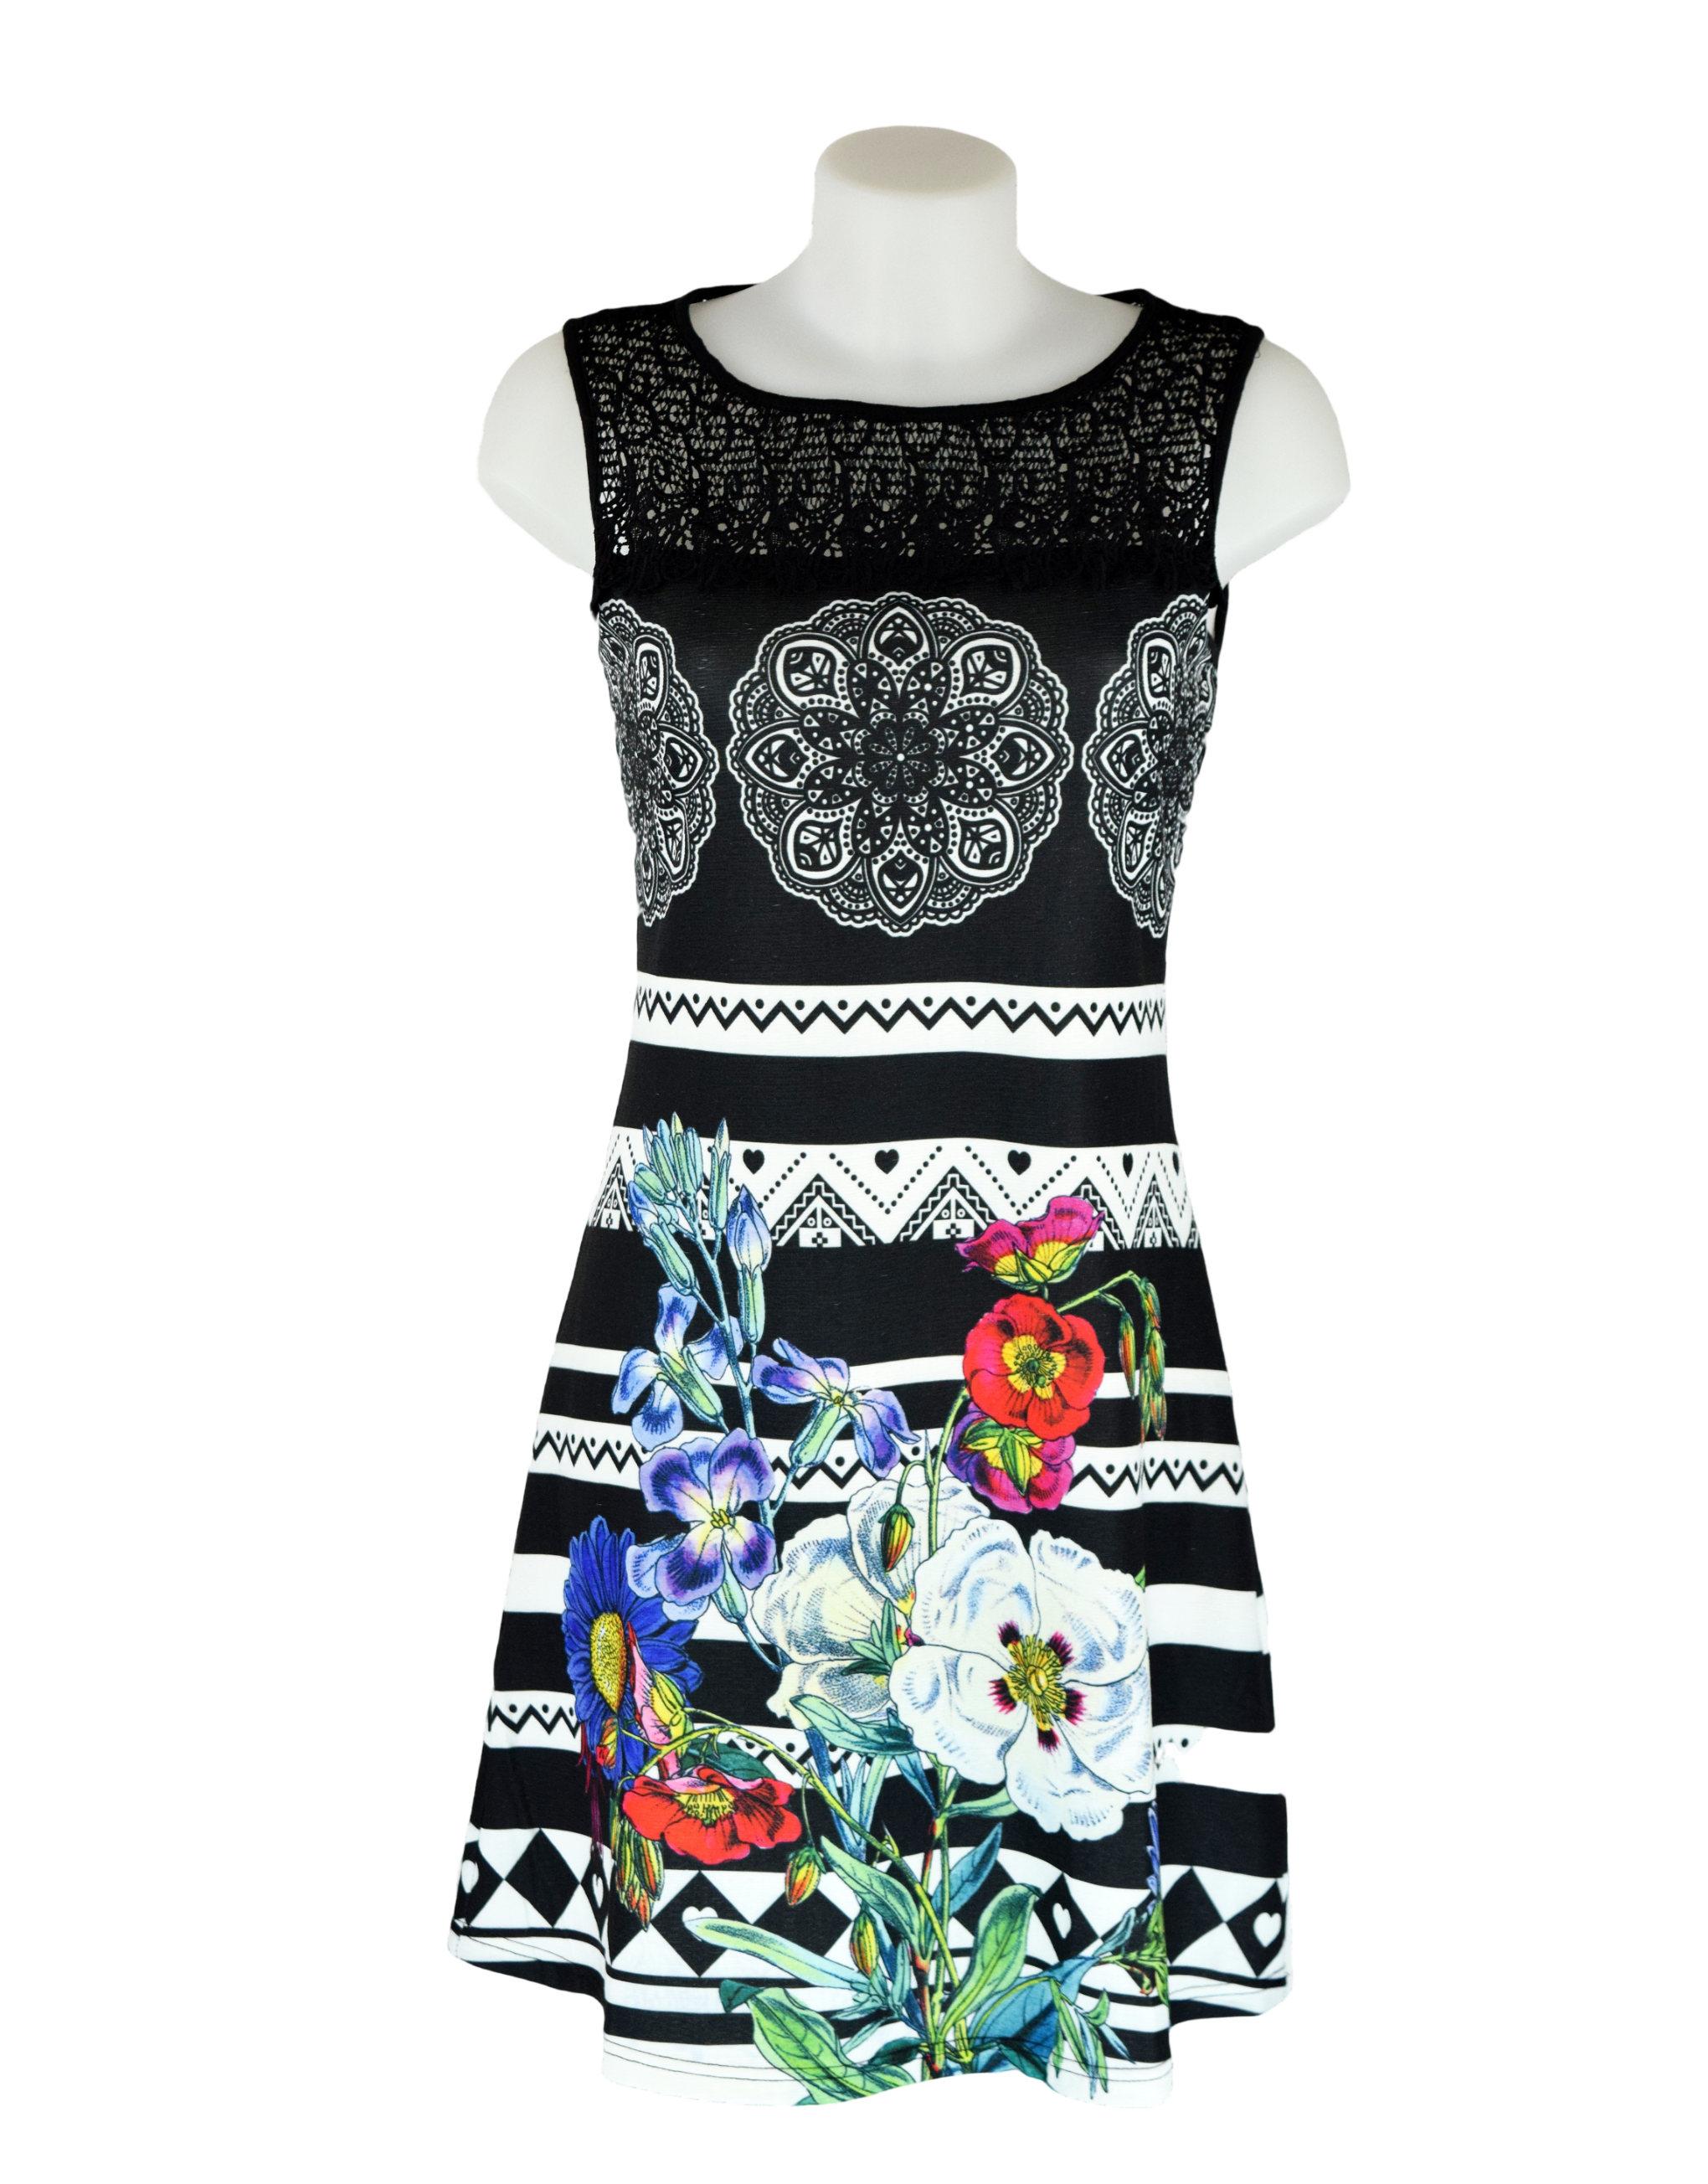 101 idees black white stripey floral dress fashion fix. Black Bedroom Furniture Sets. Home Design Ideas